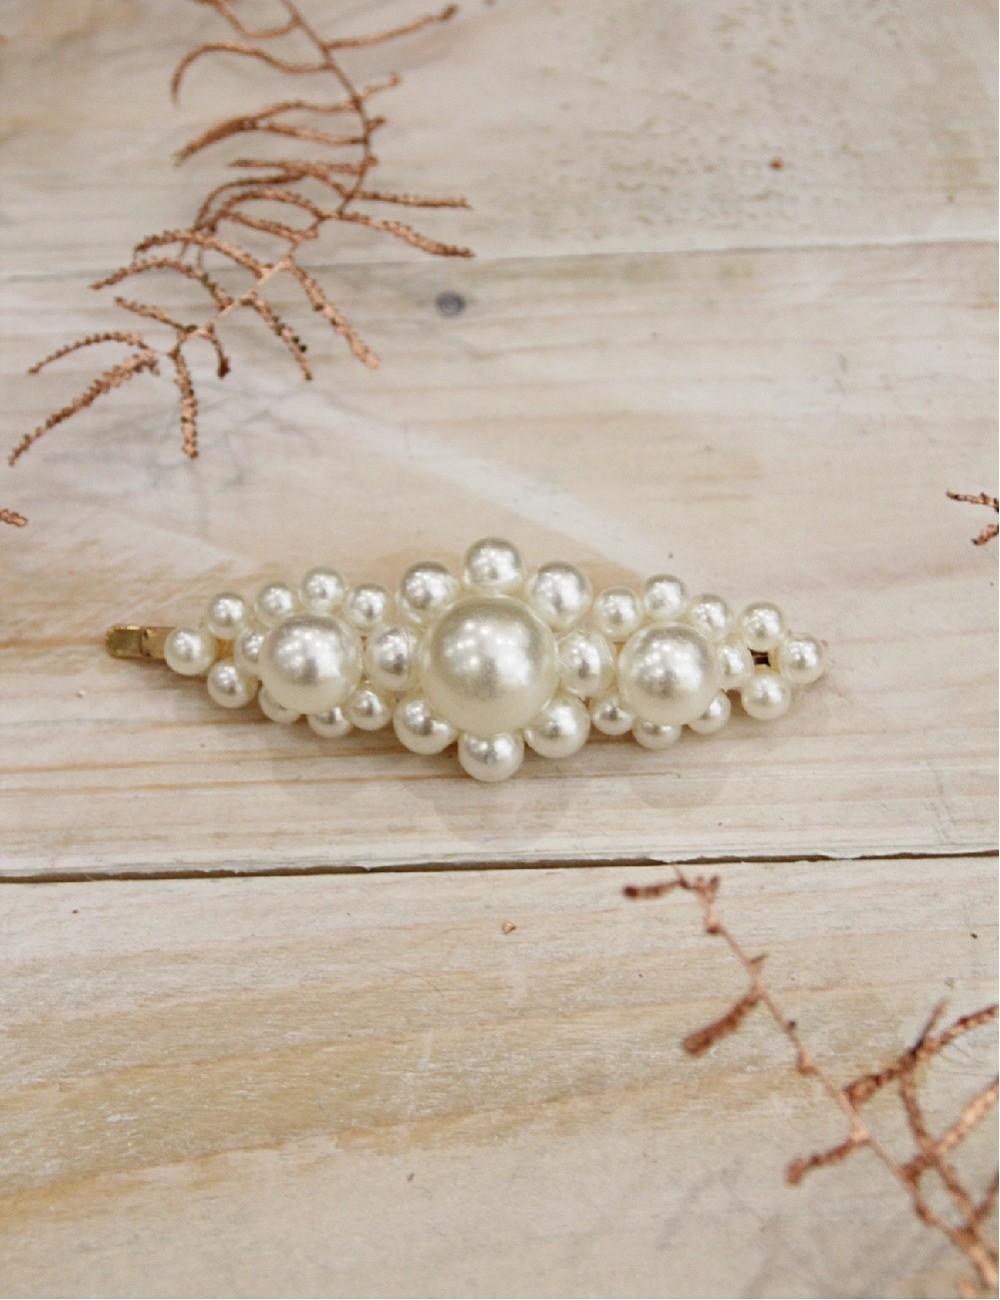 Barrette pince grosses perles - Boutique l'ananas